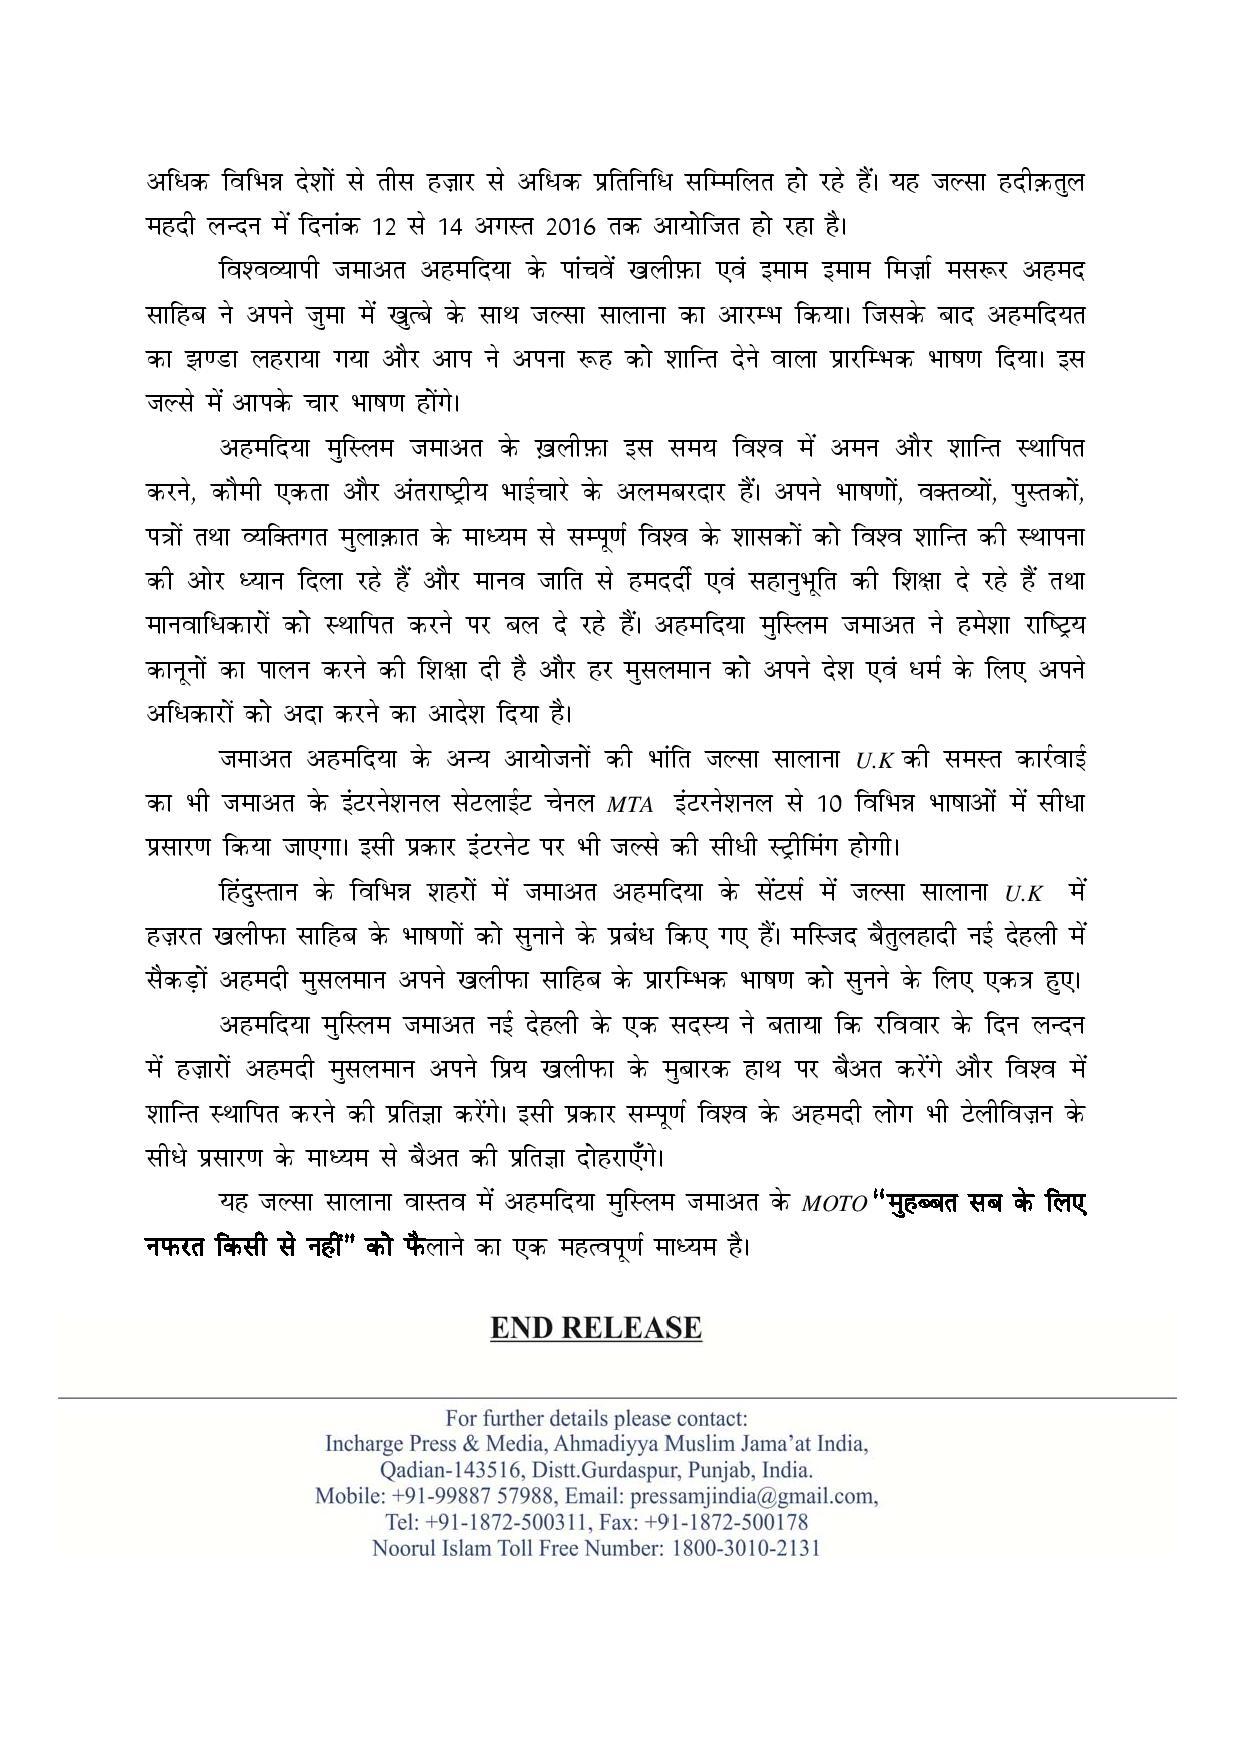 Hindi Press Release from Ahmadiyya Muslim Community Qadian, India